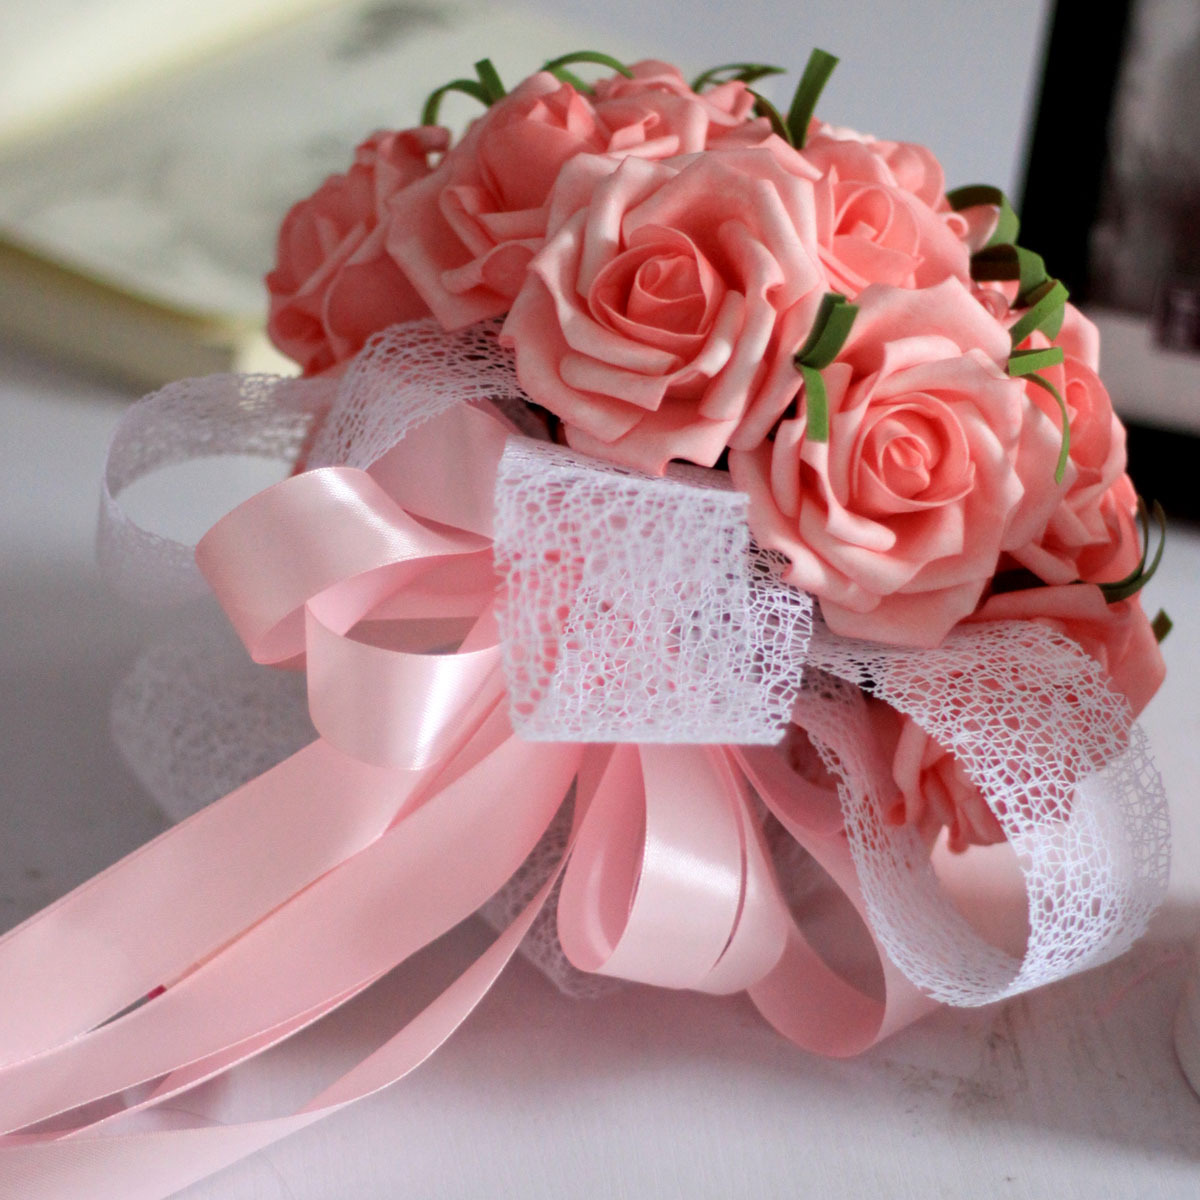 Online shop new year romantic pink ribbon rose wedding bridal online shop new year romantic pink ribbon rose wedding bridal bridesmaid flower bouquet bride holding elegant silk flower free ship aliexpress mobile mightylinksfo